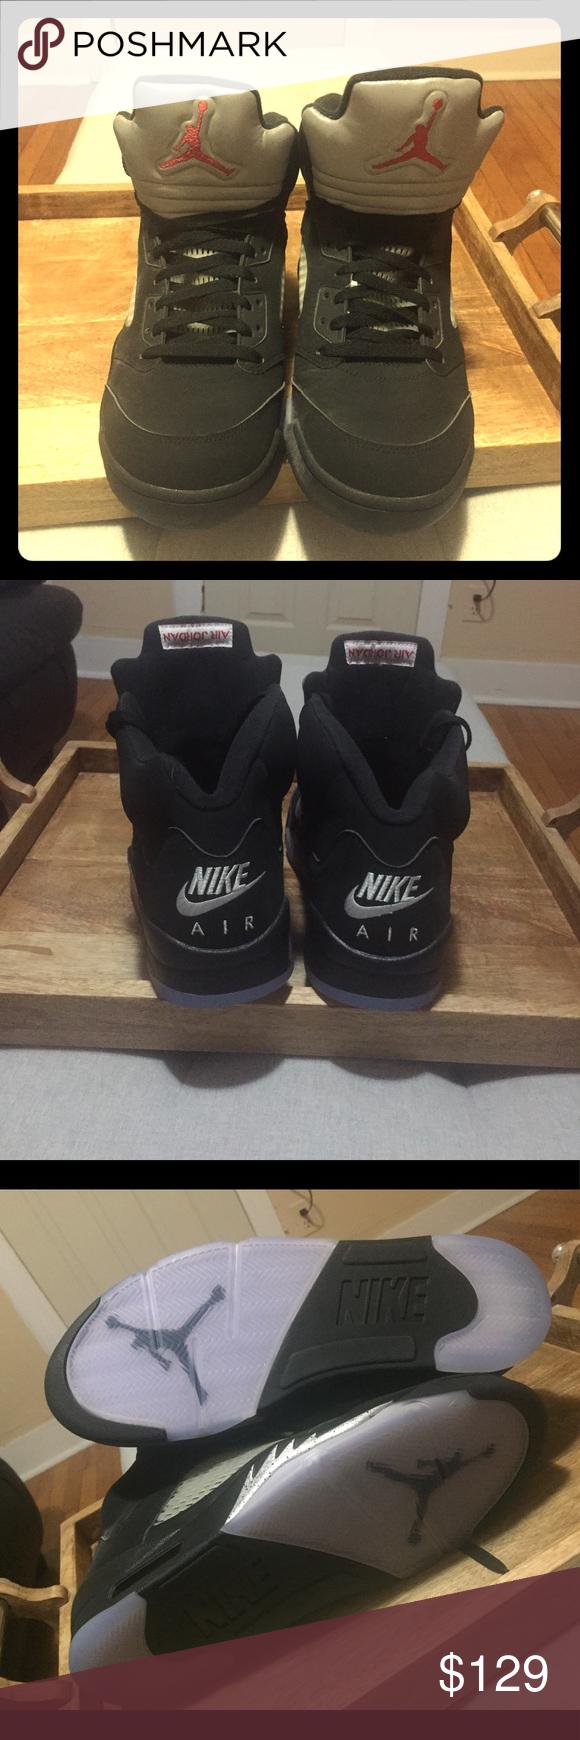 new style 0e48d 09da0 Nike Air Jordan Retro 5 Black metallic OG - black with photo reflective  tongue. Size 13 Men s- never worn Nike Shoes Sneakers